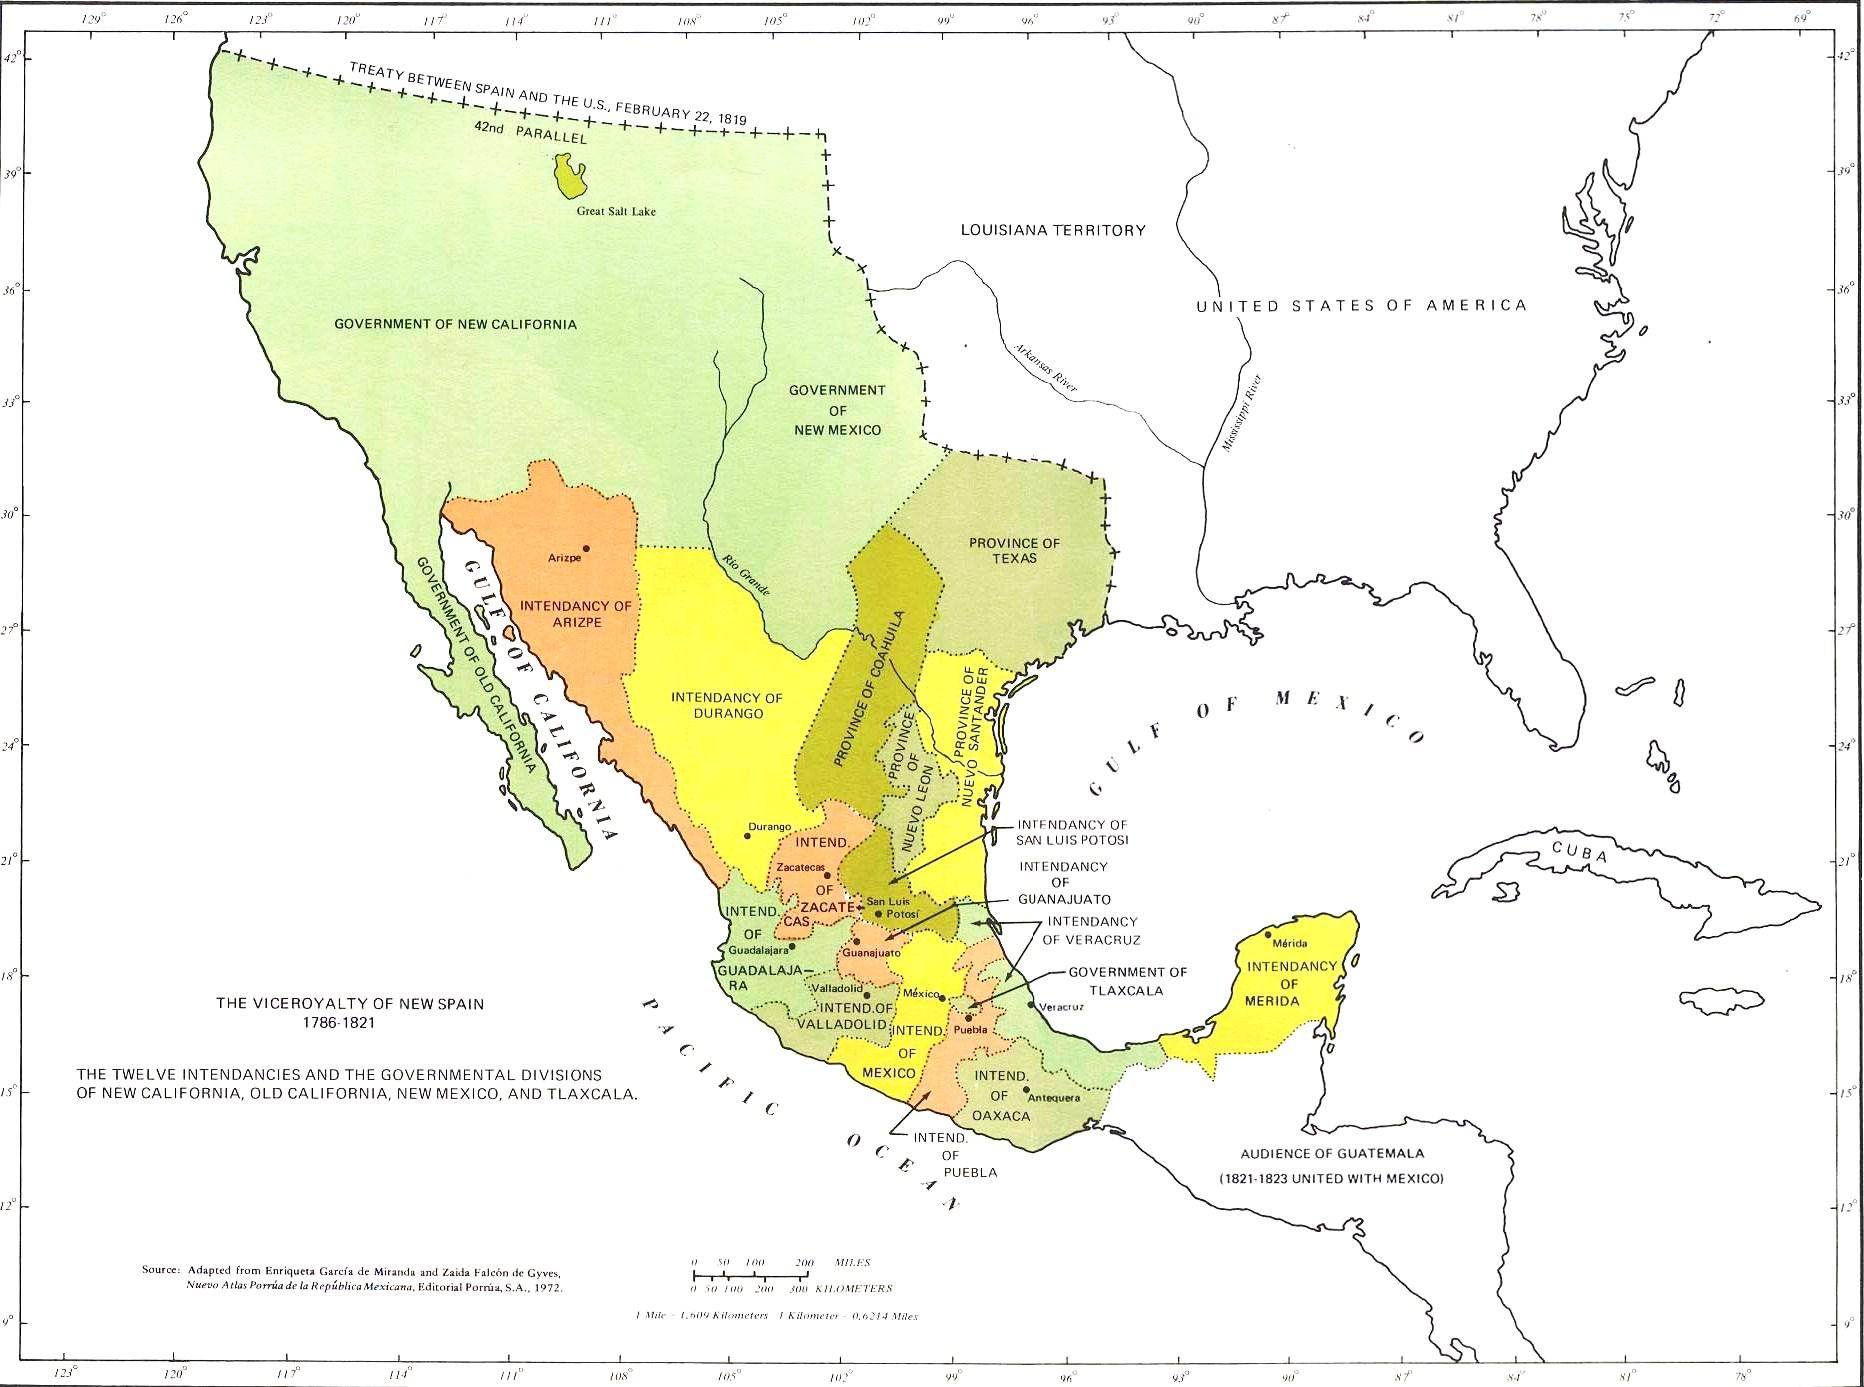 Viva M xico – Map of Mexico 1821